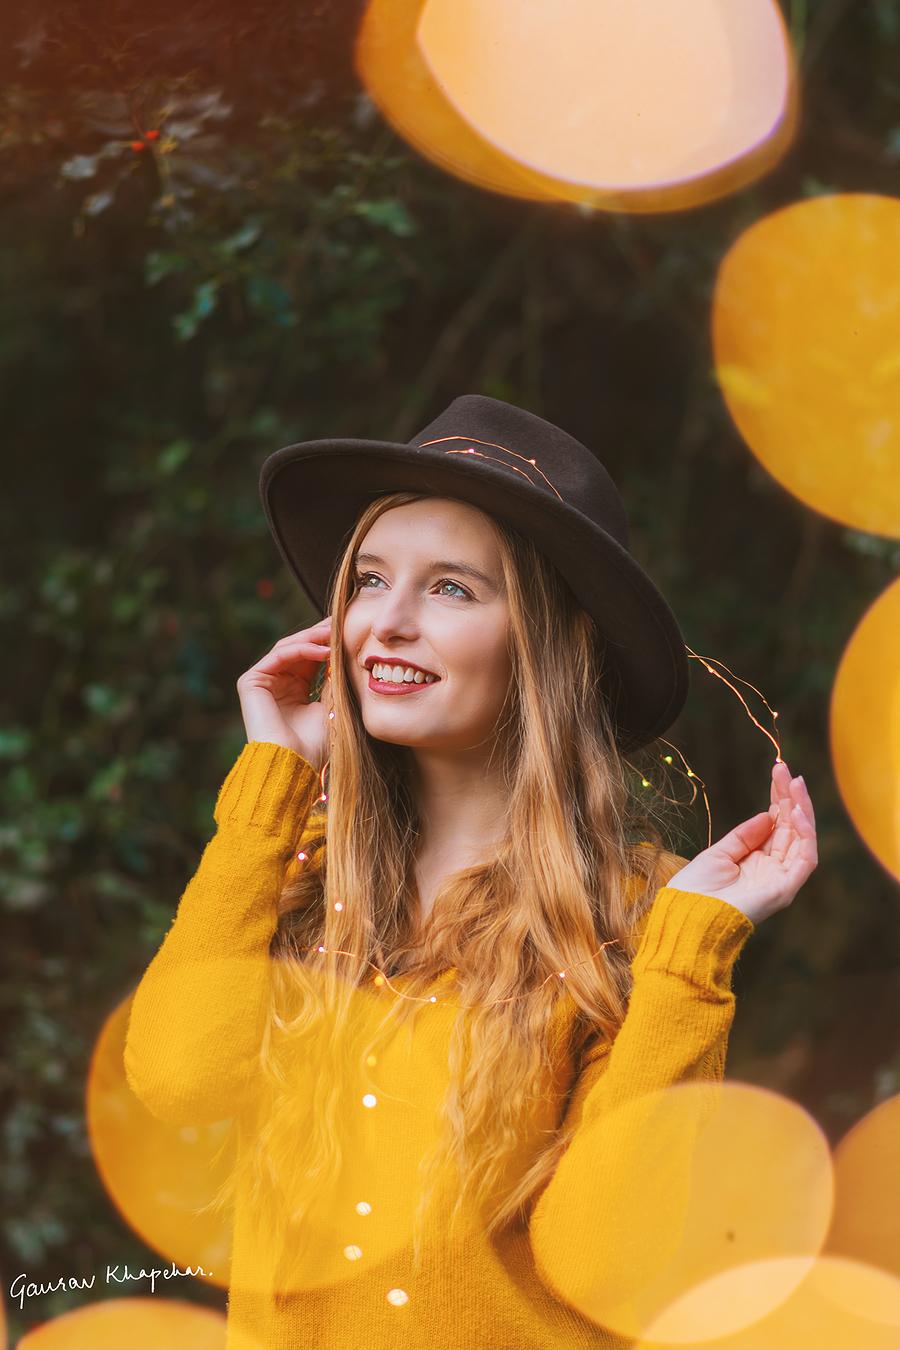 Autumnal Winter Fashion / Photography by Gaurav Khapekar Photography, Model Jade Lyon / Uploaded 9th November 2019 @ 08:07 PM